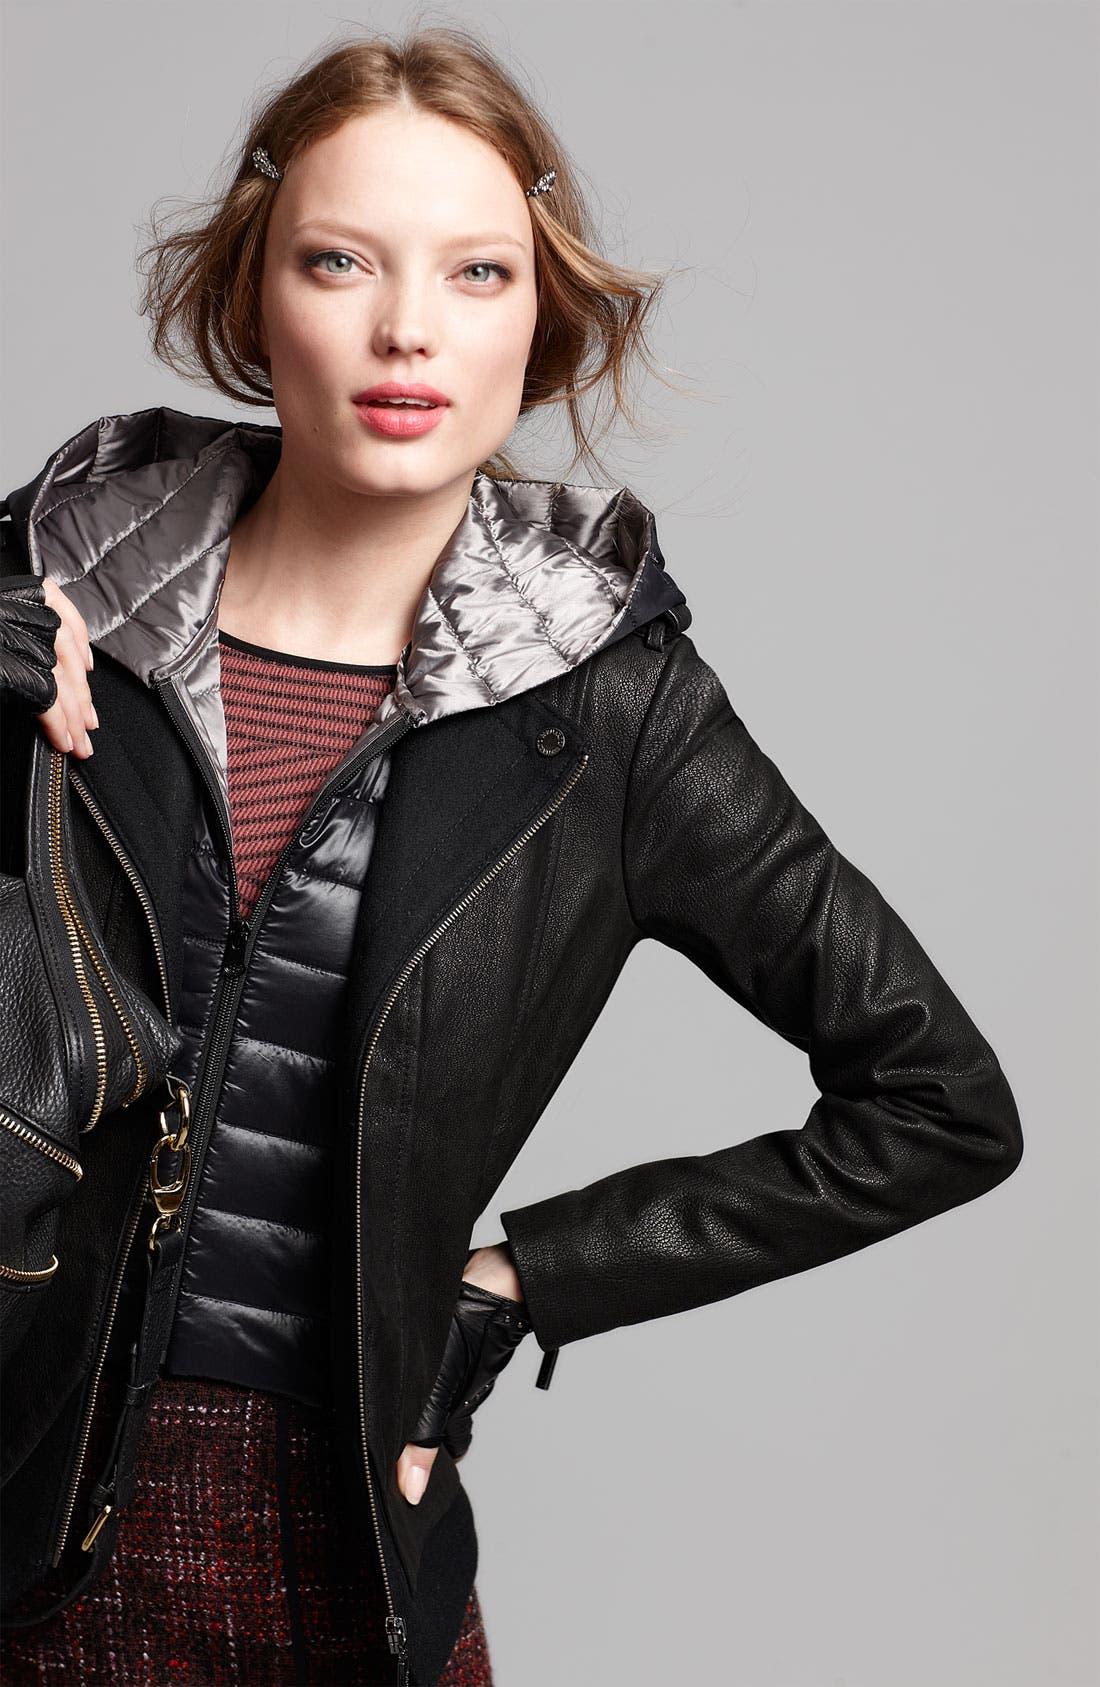 Alternate Image 1 Selected - Bernardo Leather Jacket, Halogen® Sweater & Skirt